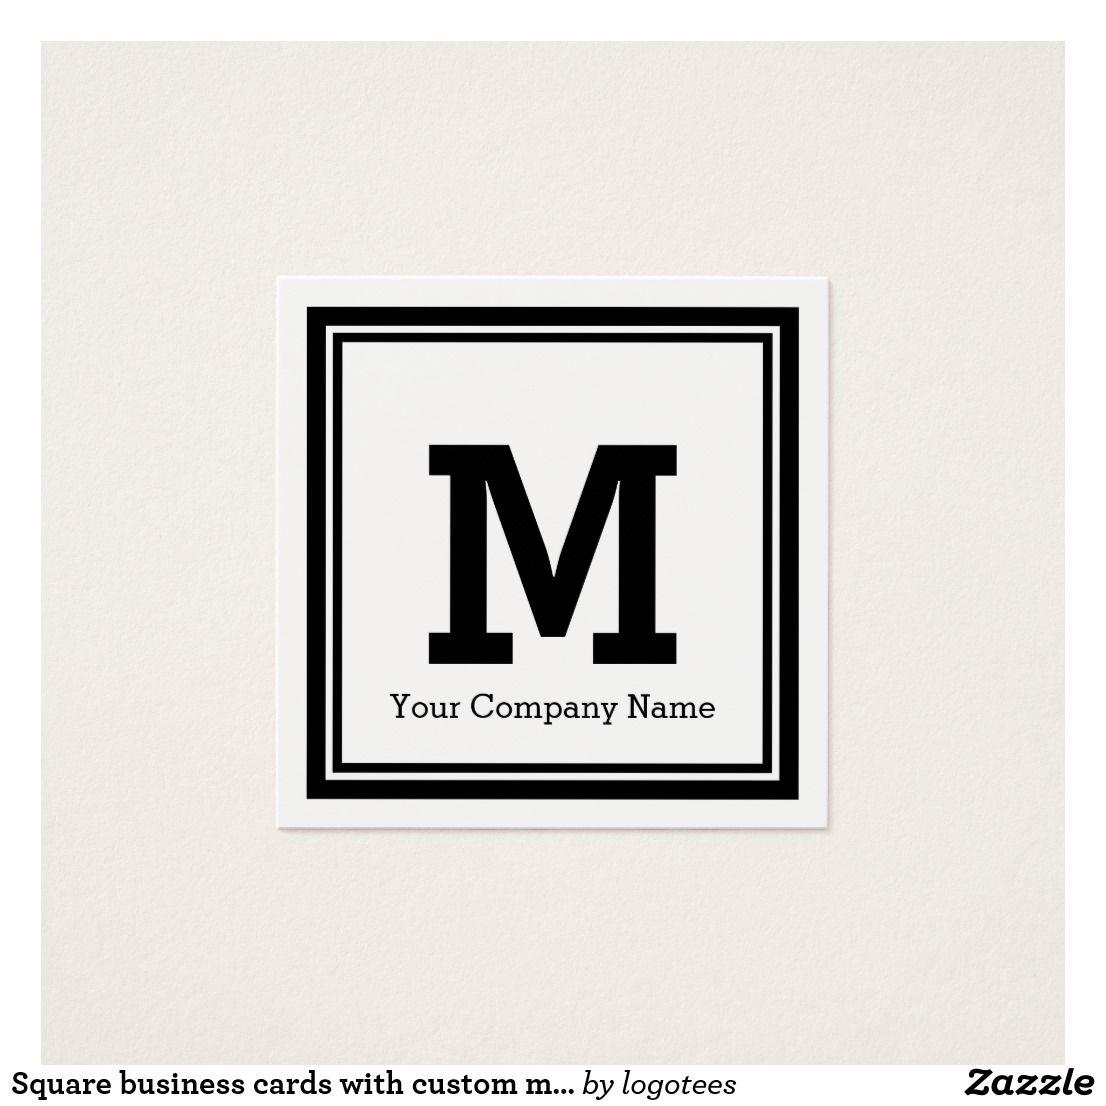 Square business cards with custom monogram logo   Monograms ...